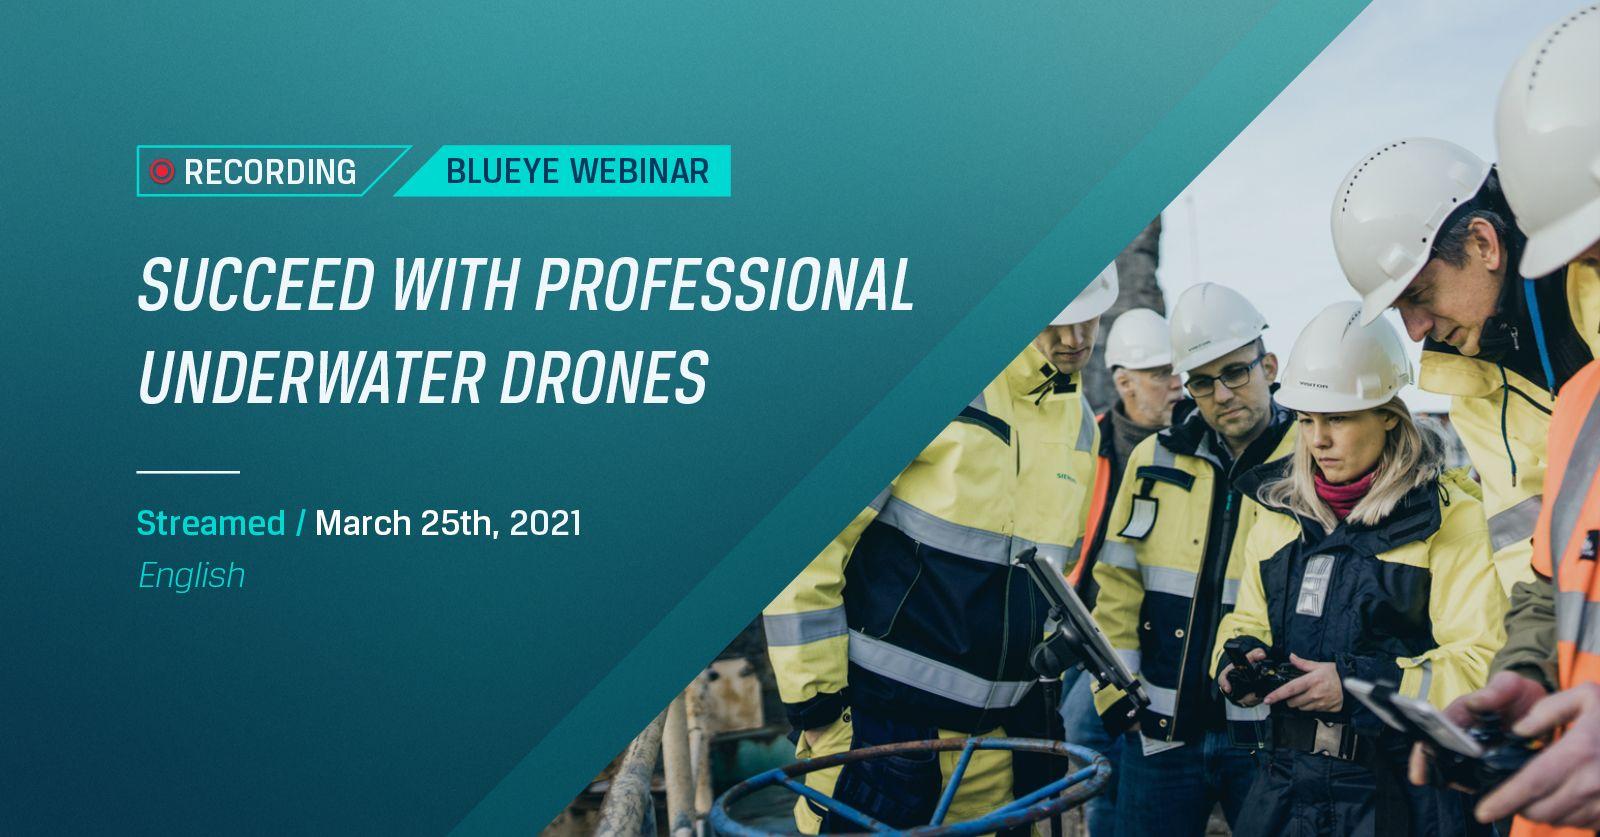 Webinar succeed to implement underwater drones in your business